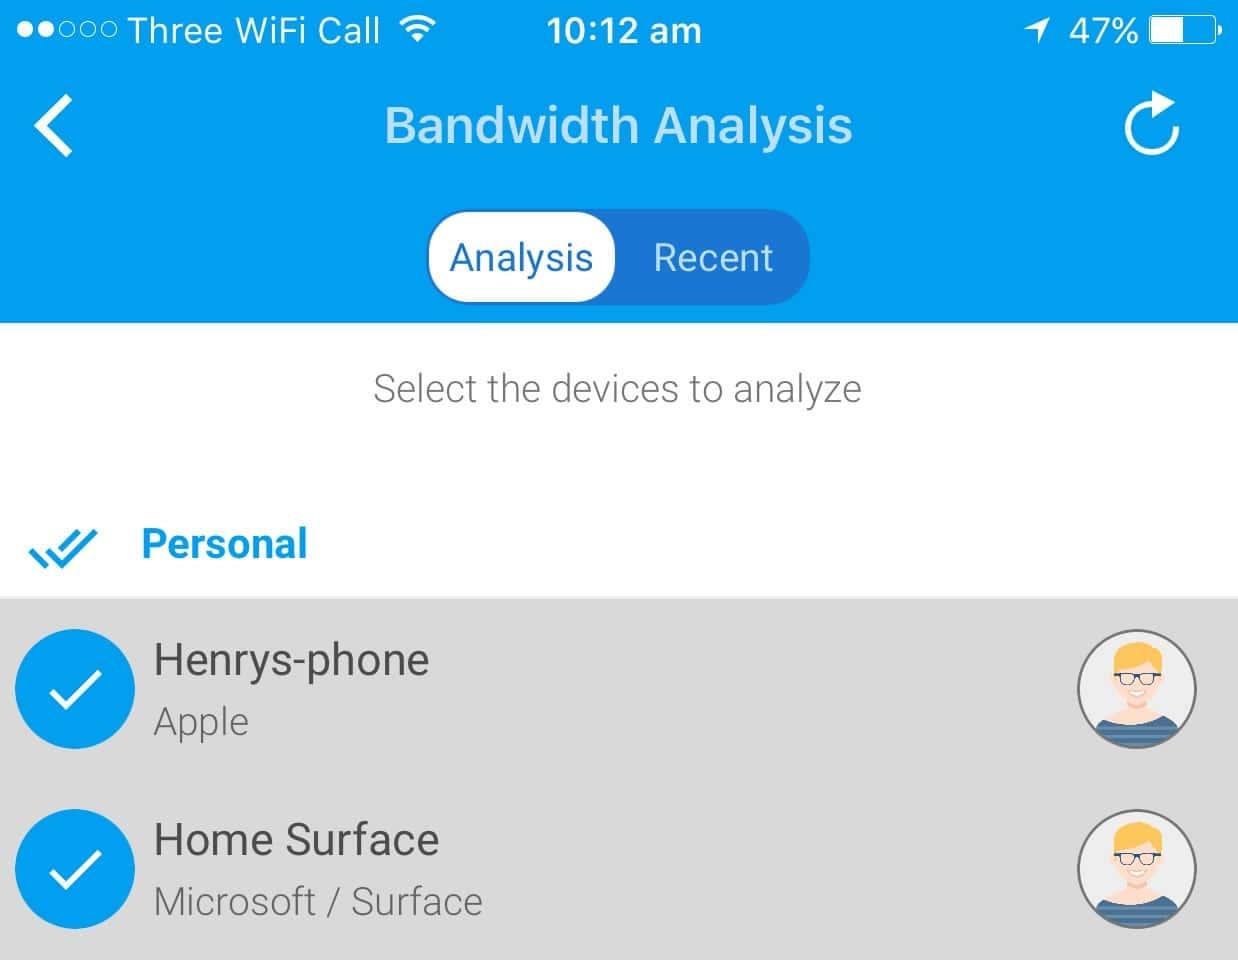 FingBox Bandwidth Analysis